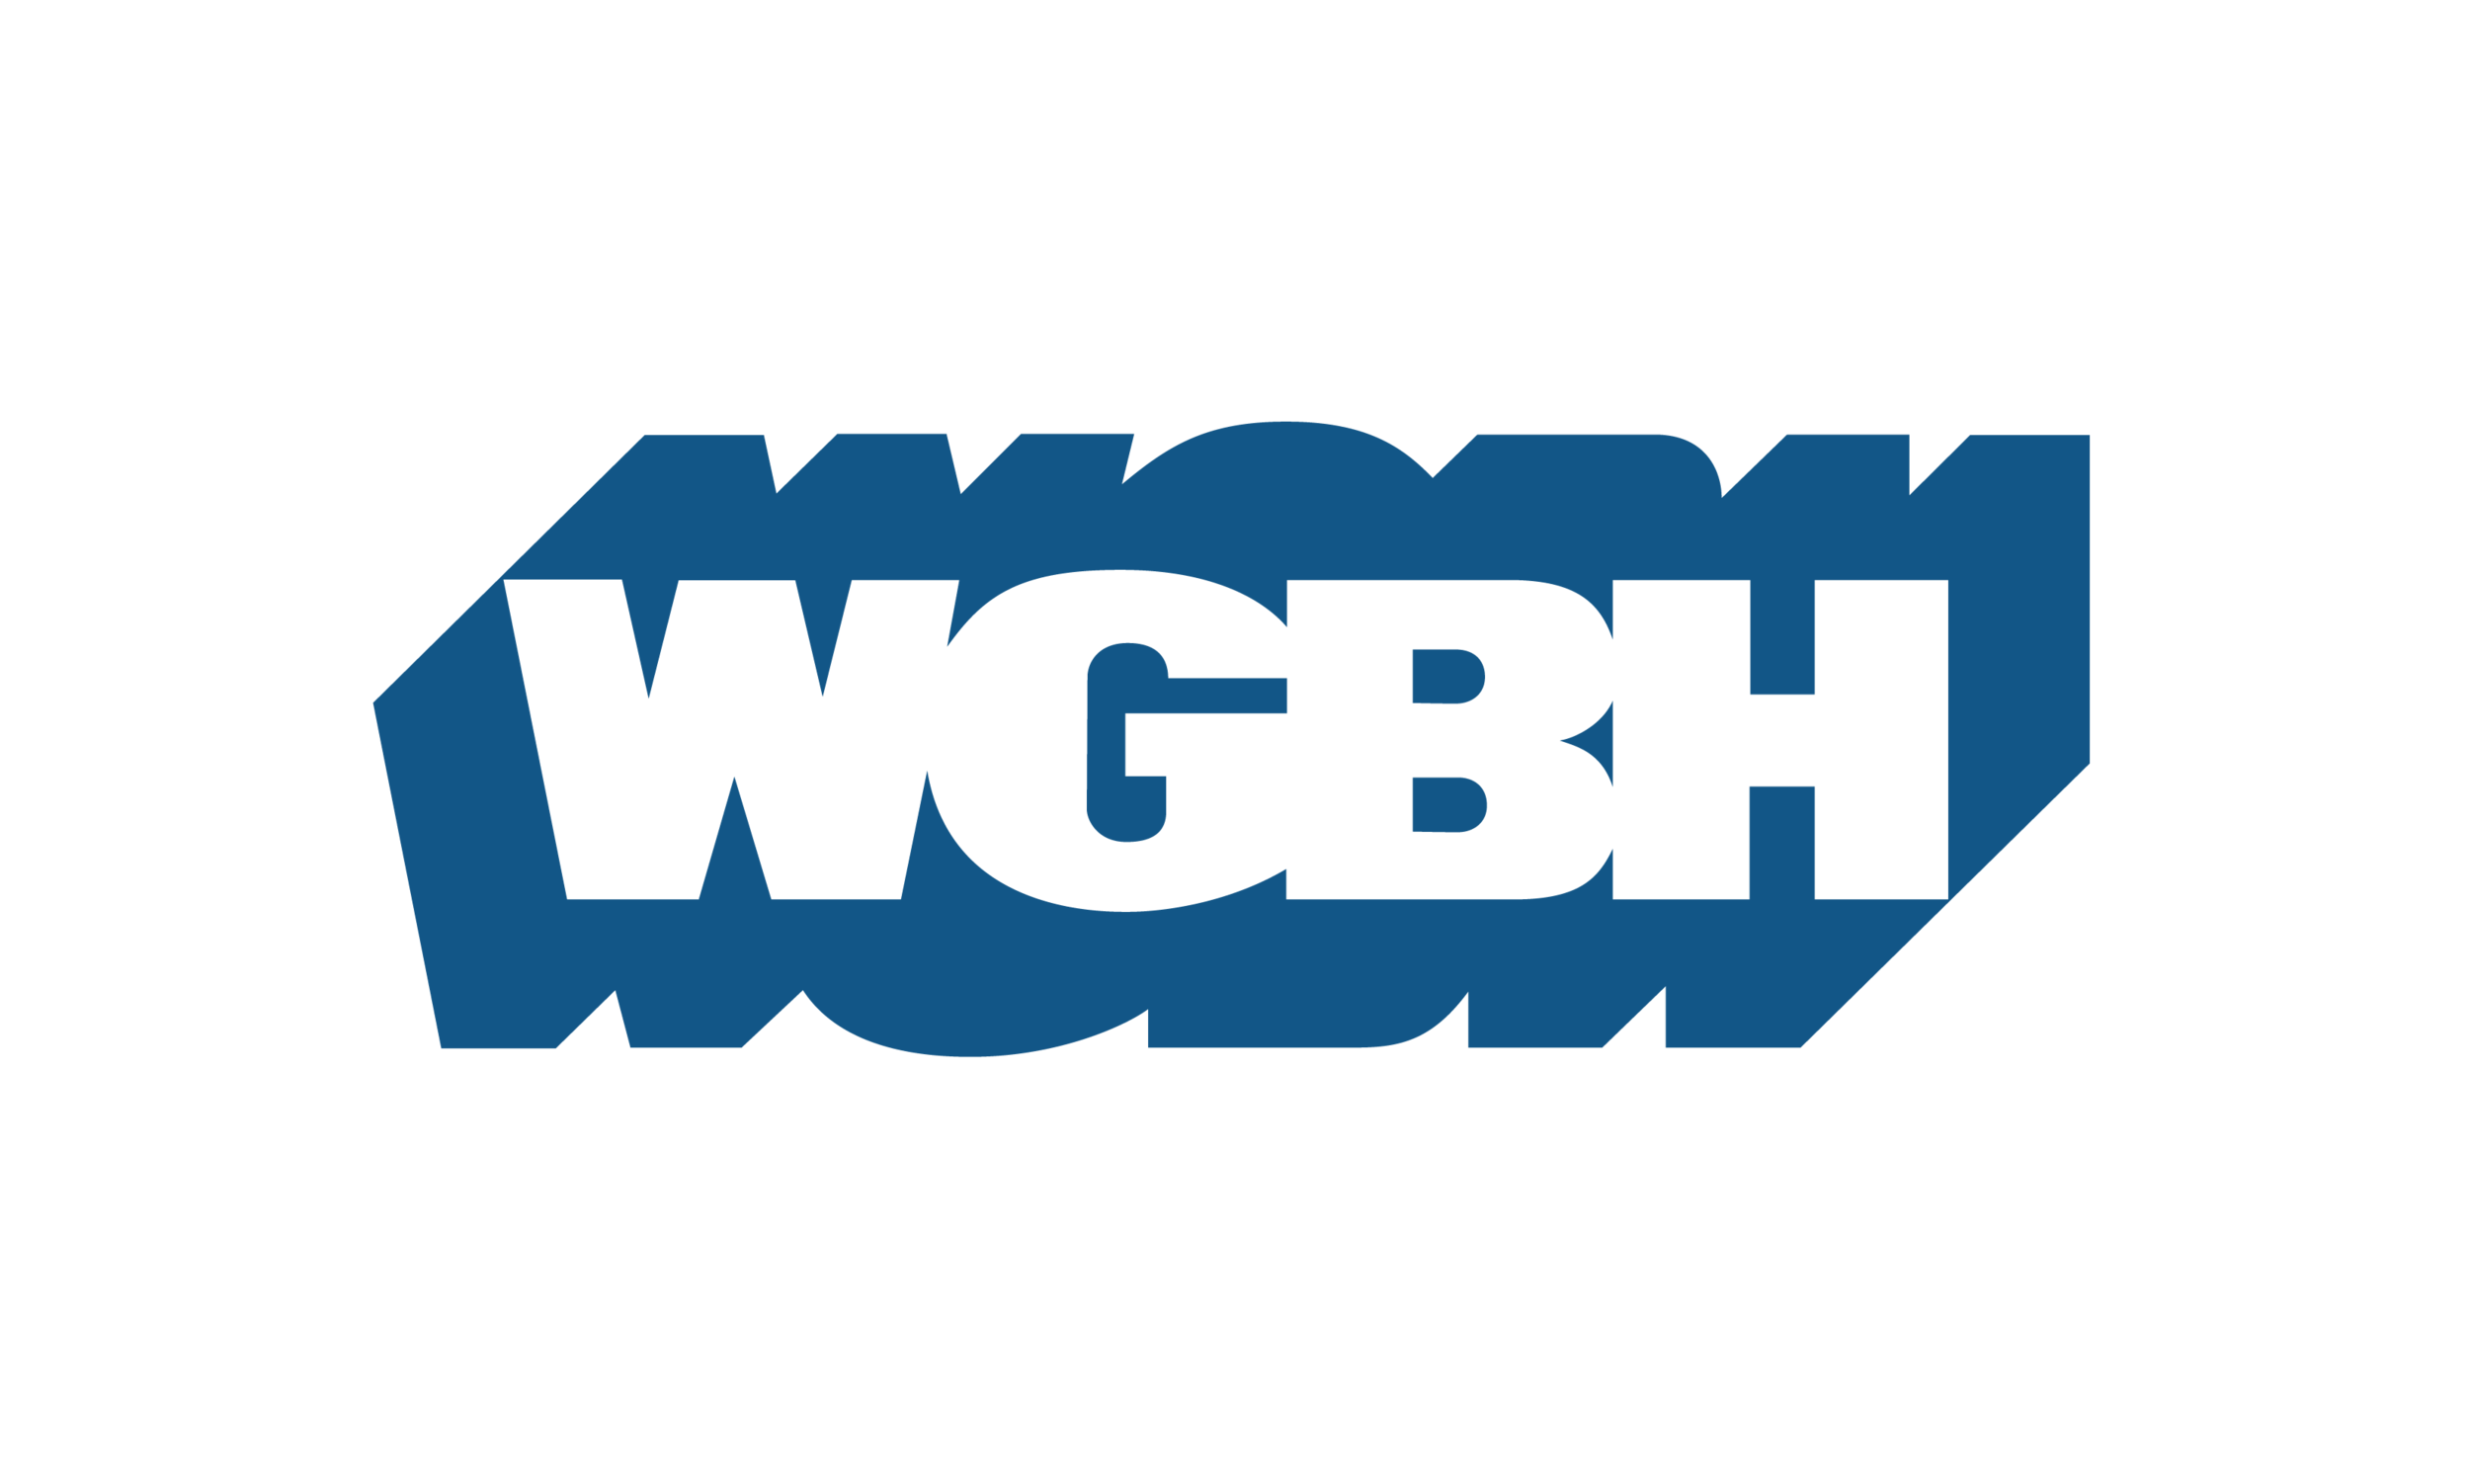 wgbh-rgb-4.png